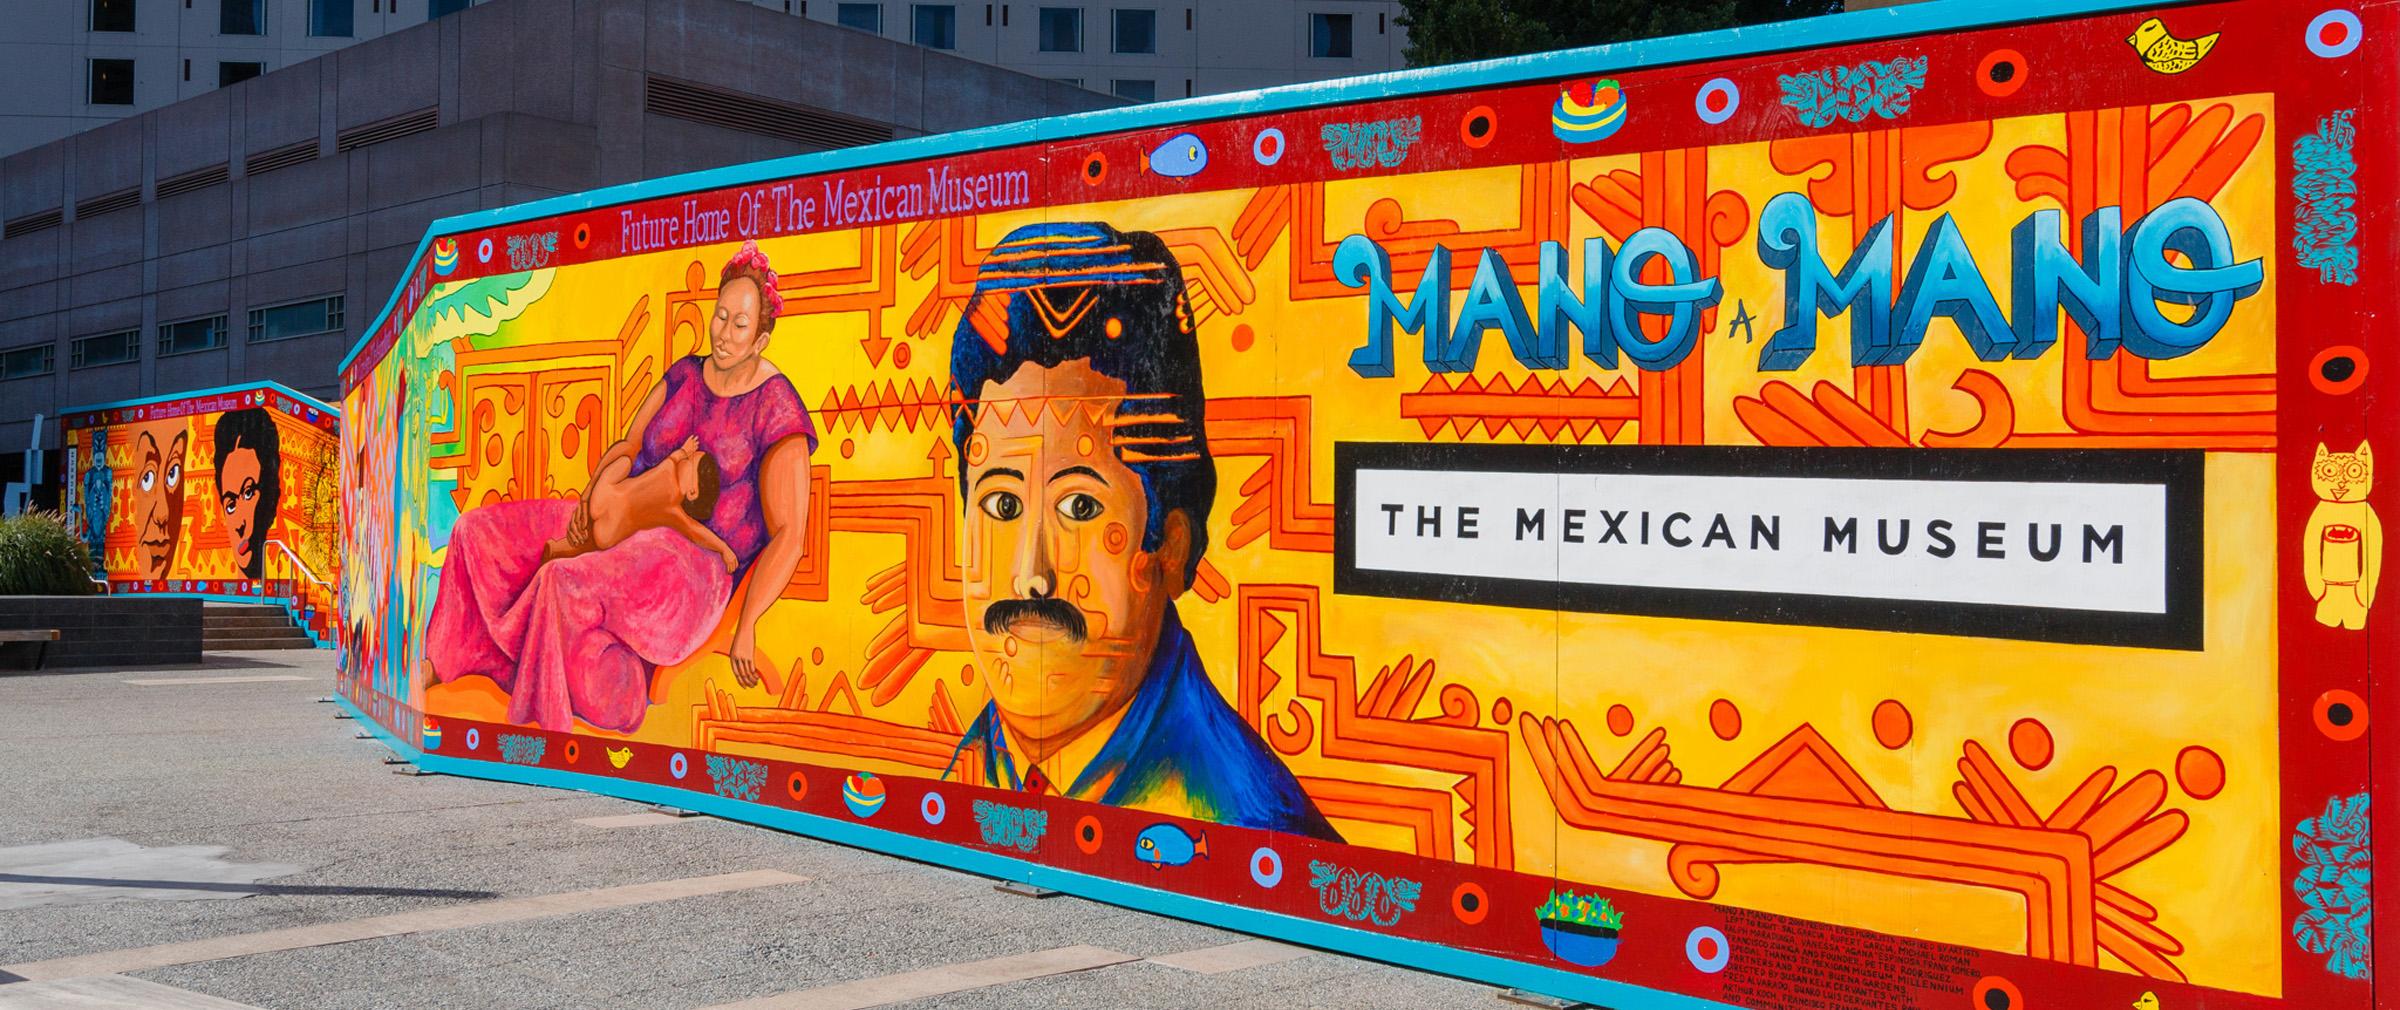 Celebrate d a de los muertos at the mexican museum for Dia de los muertos mural